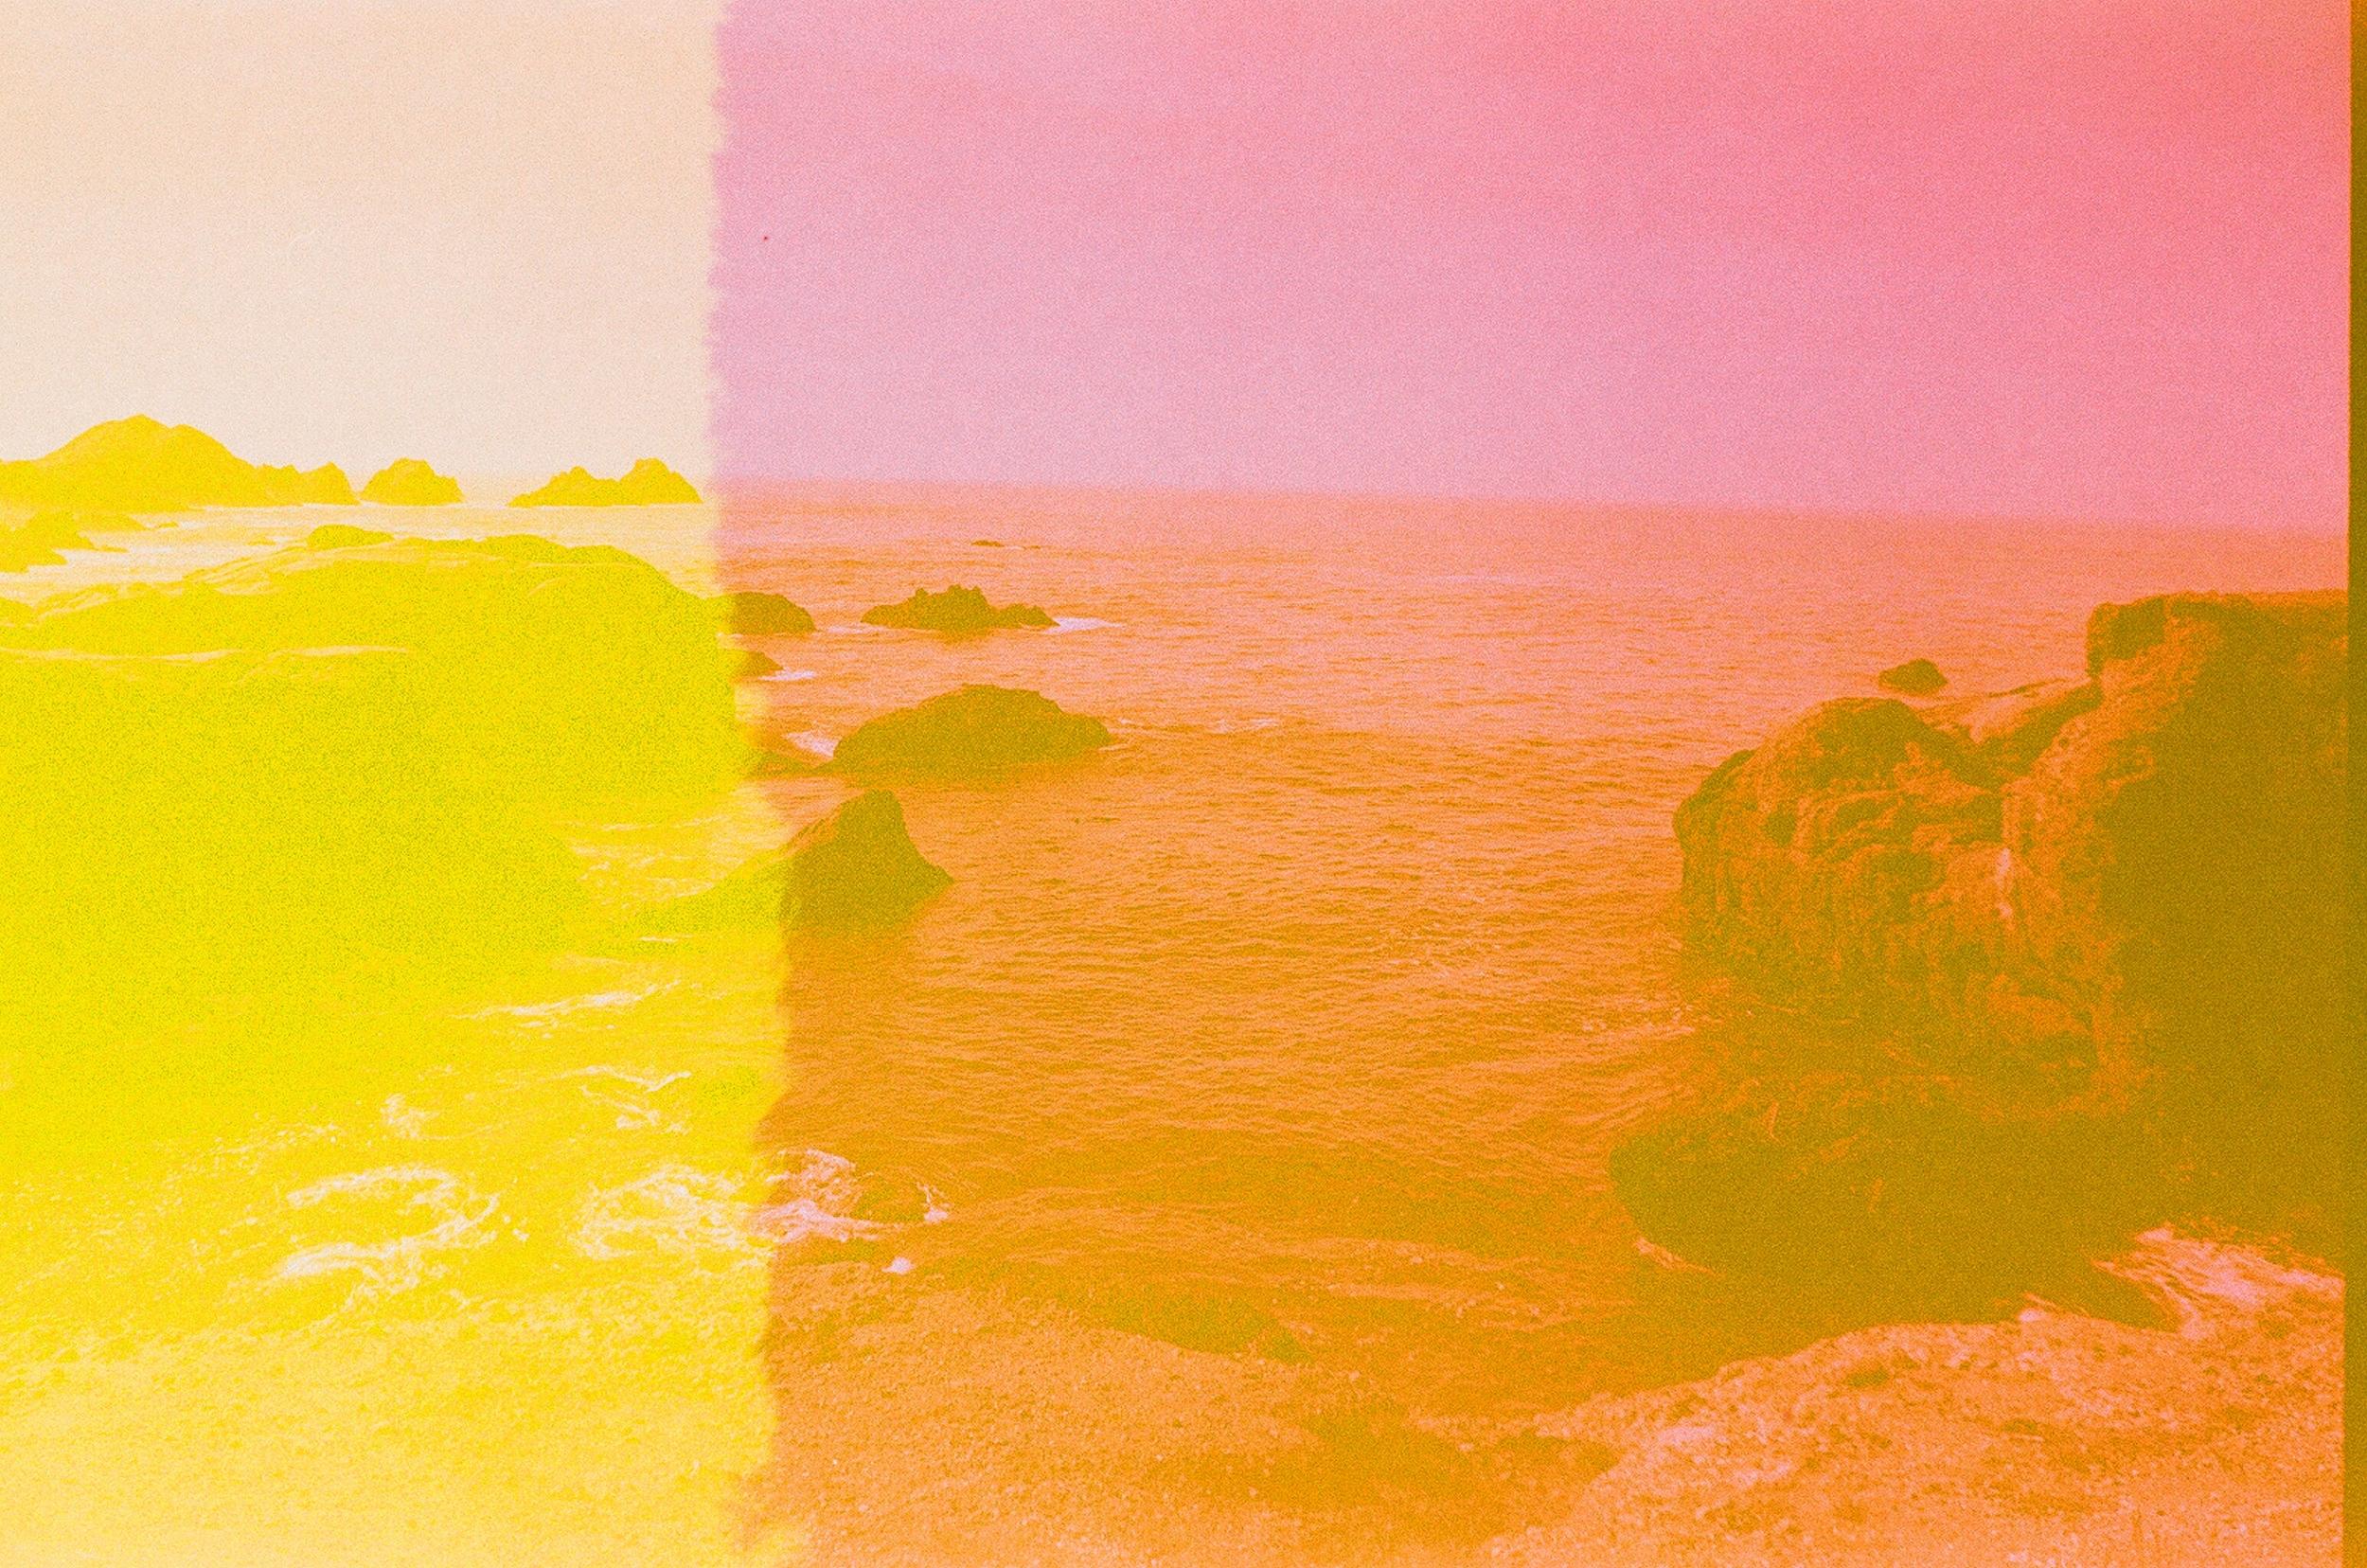 Pink Lobos, 35mm